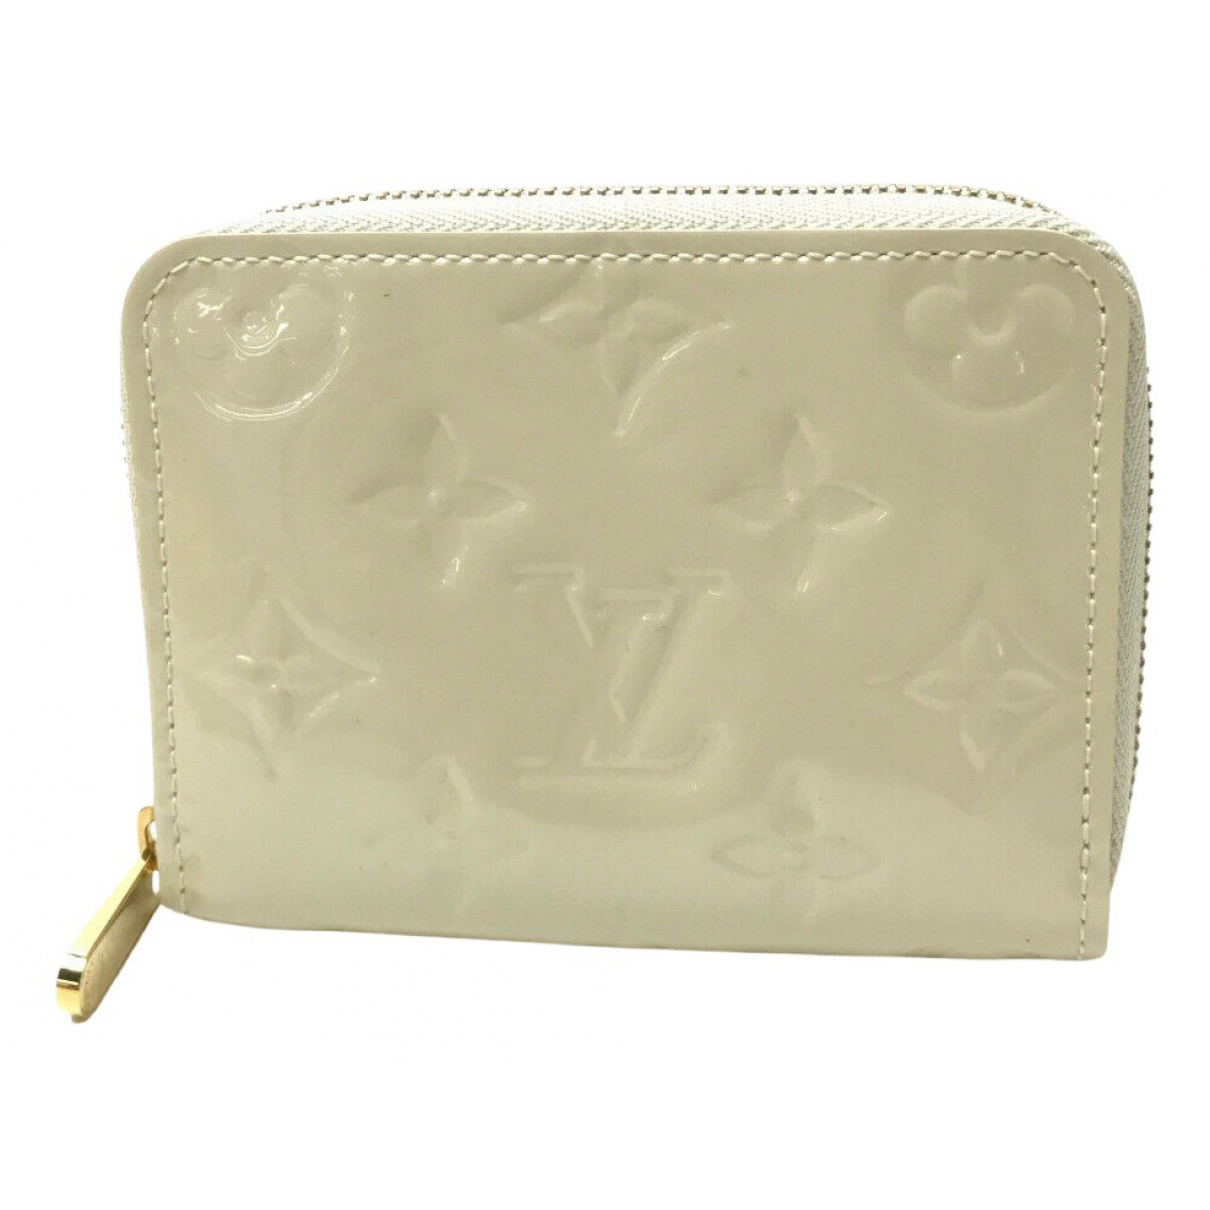 Cartera Zippy de Charol Louis Vuitton